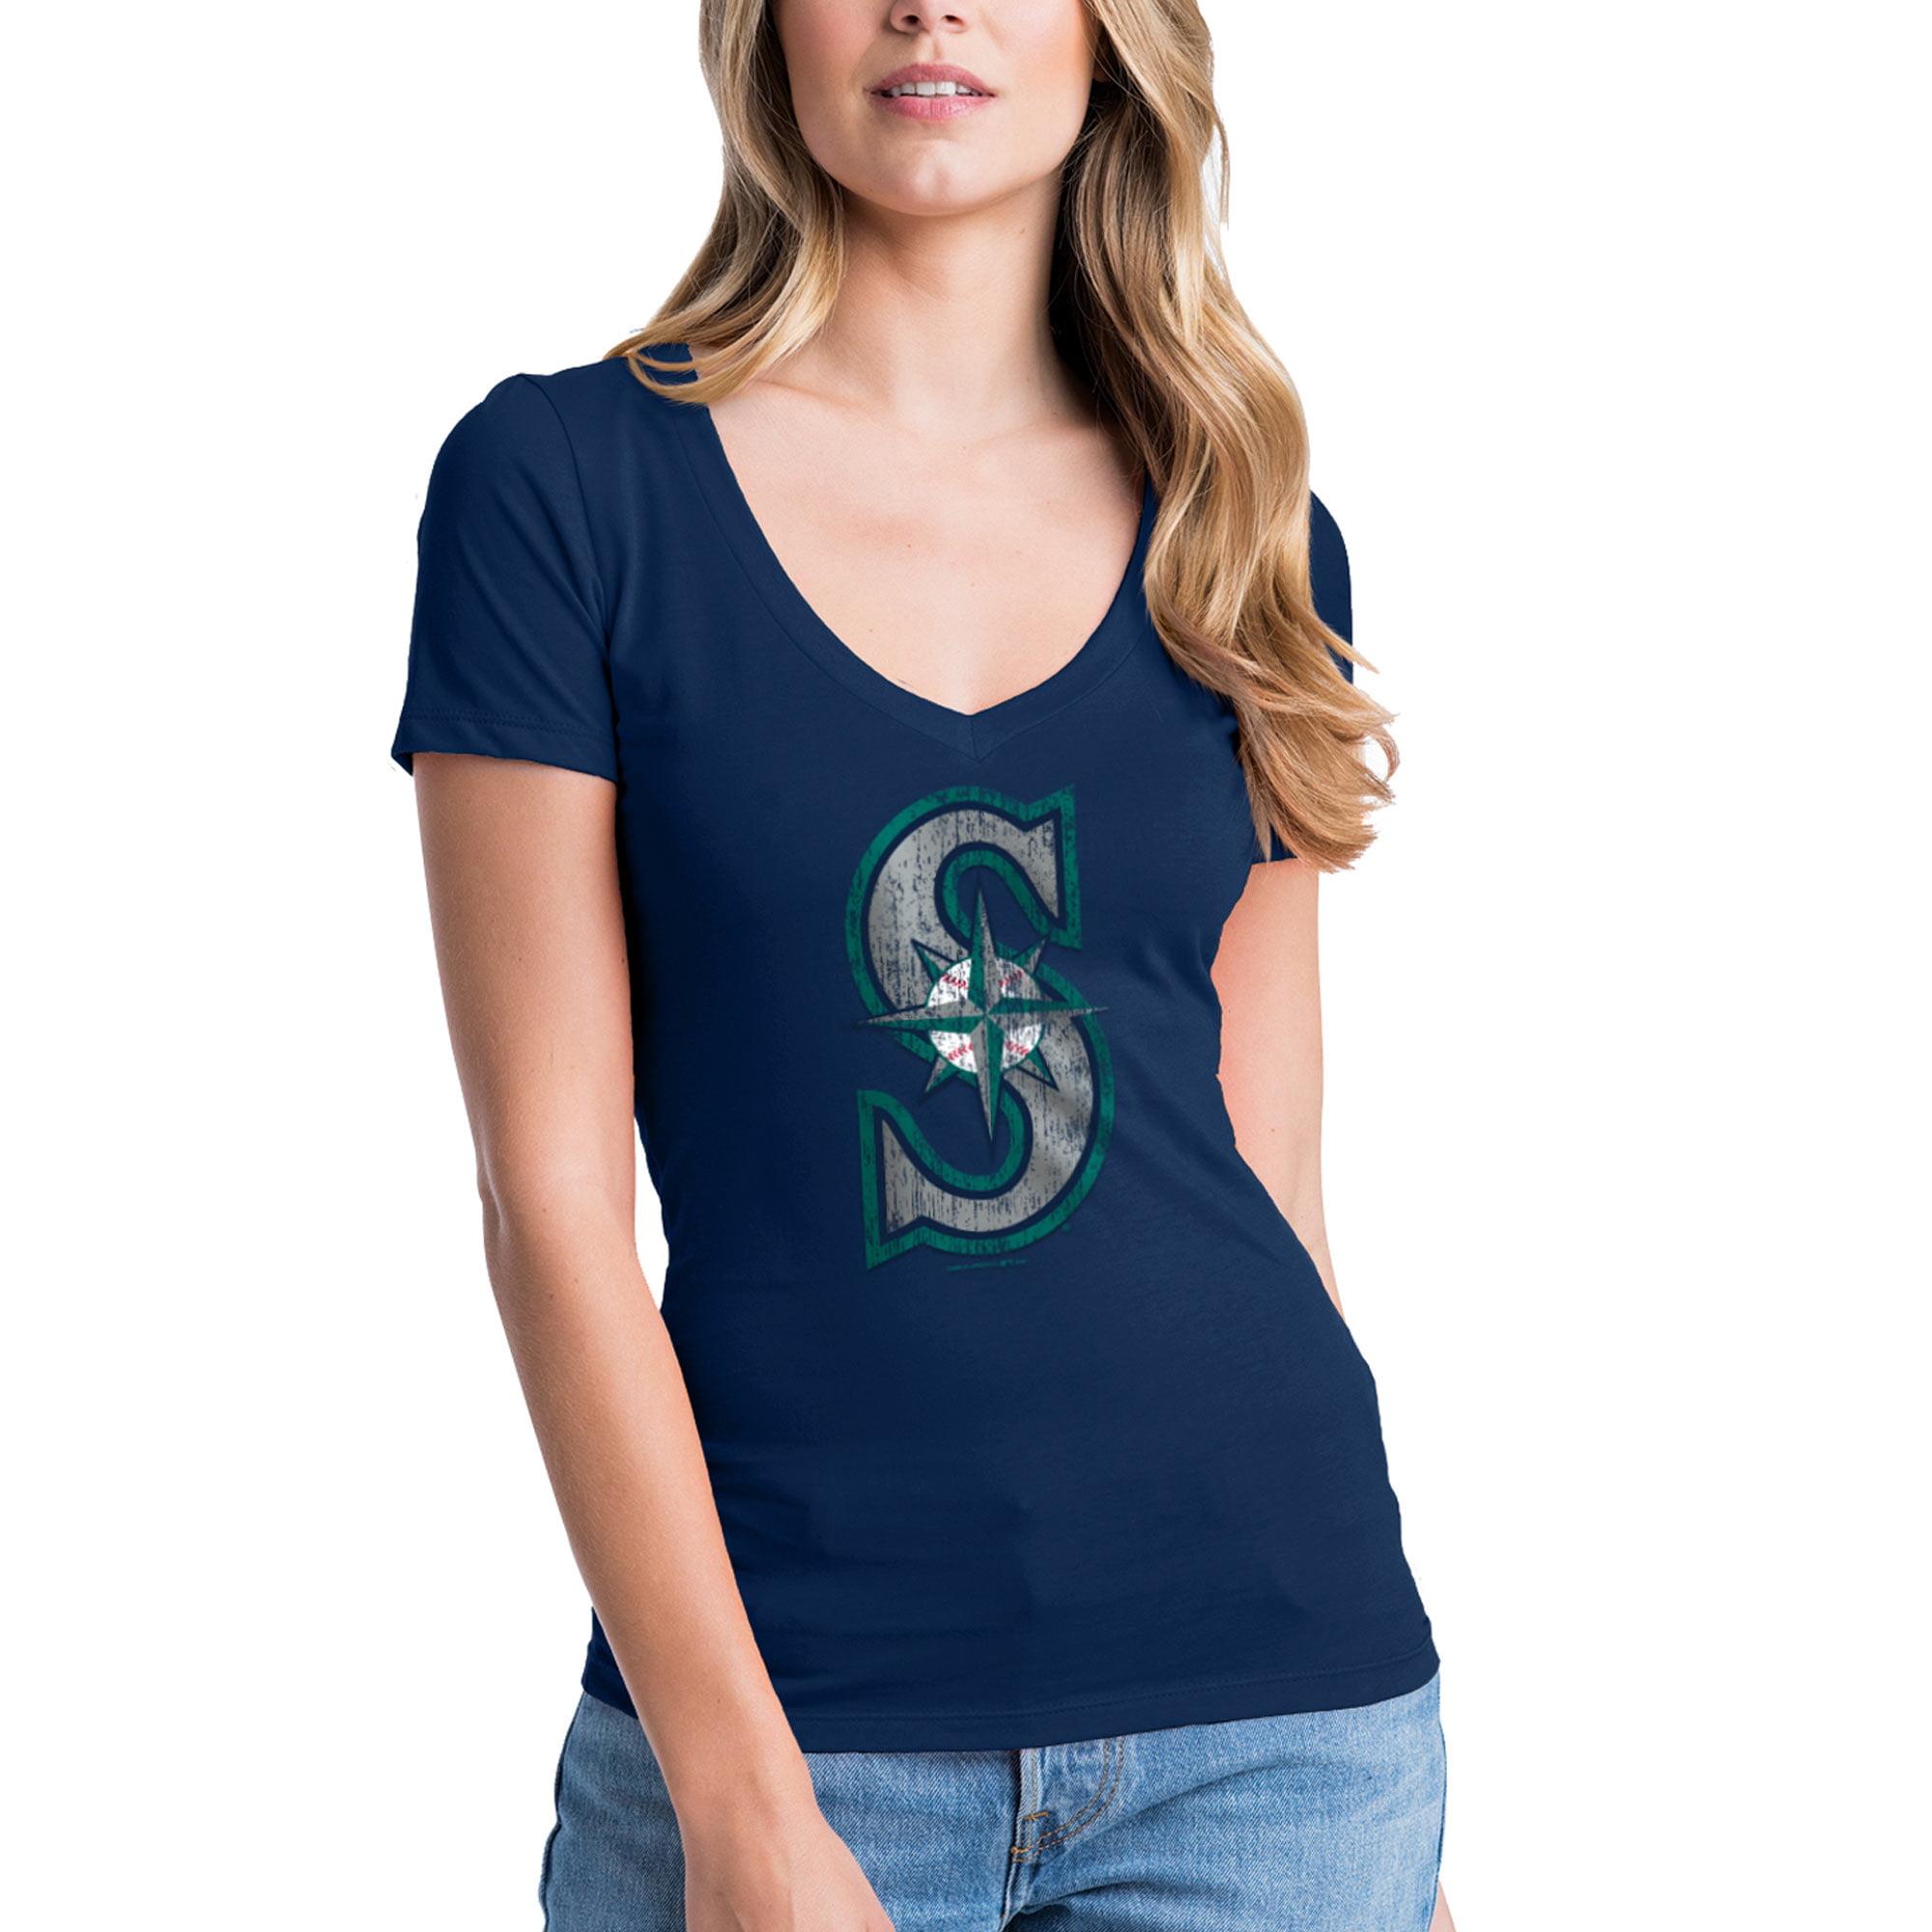 Seattle Mariners New Era Women's V-Neck T-Shirt - Navy